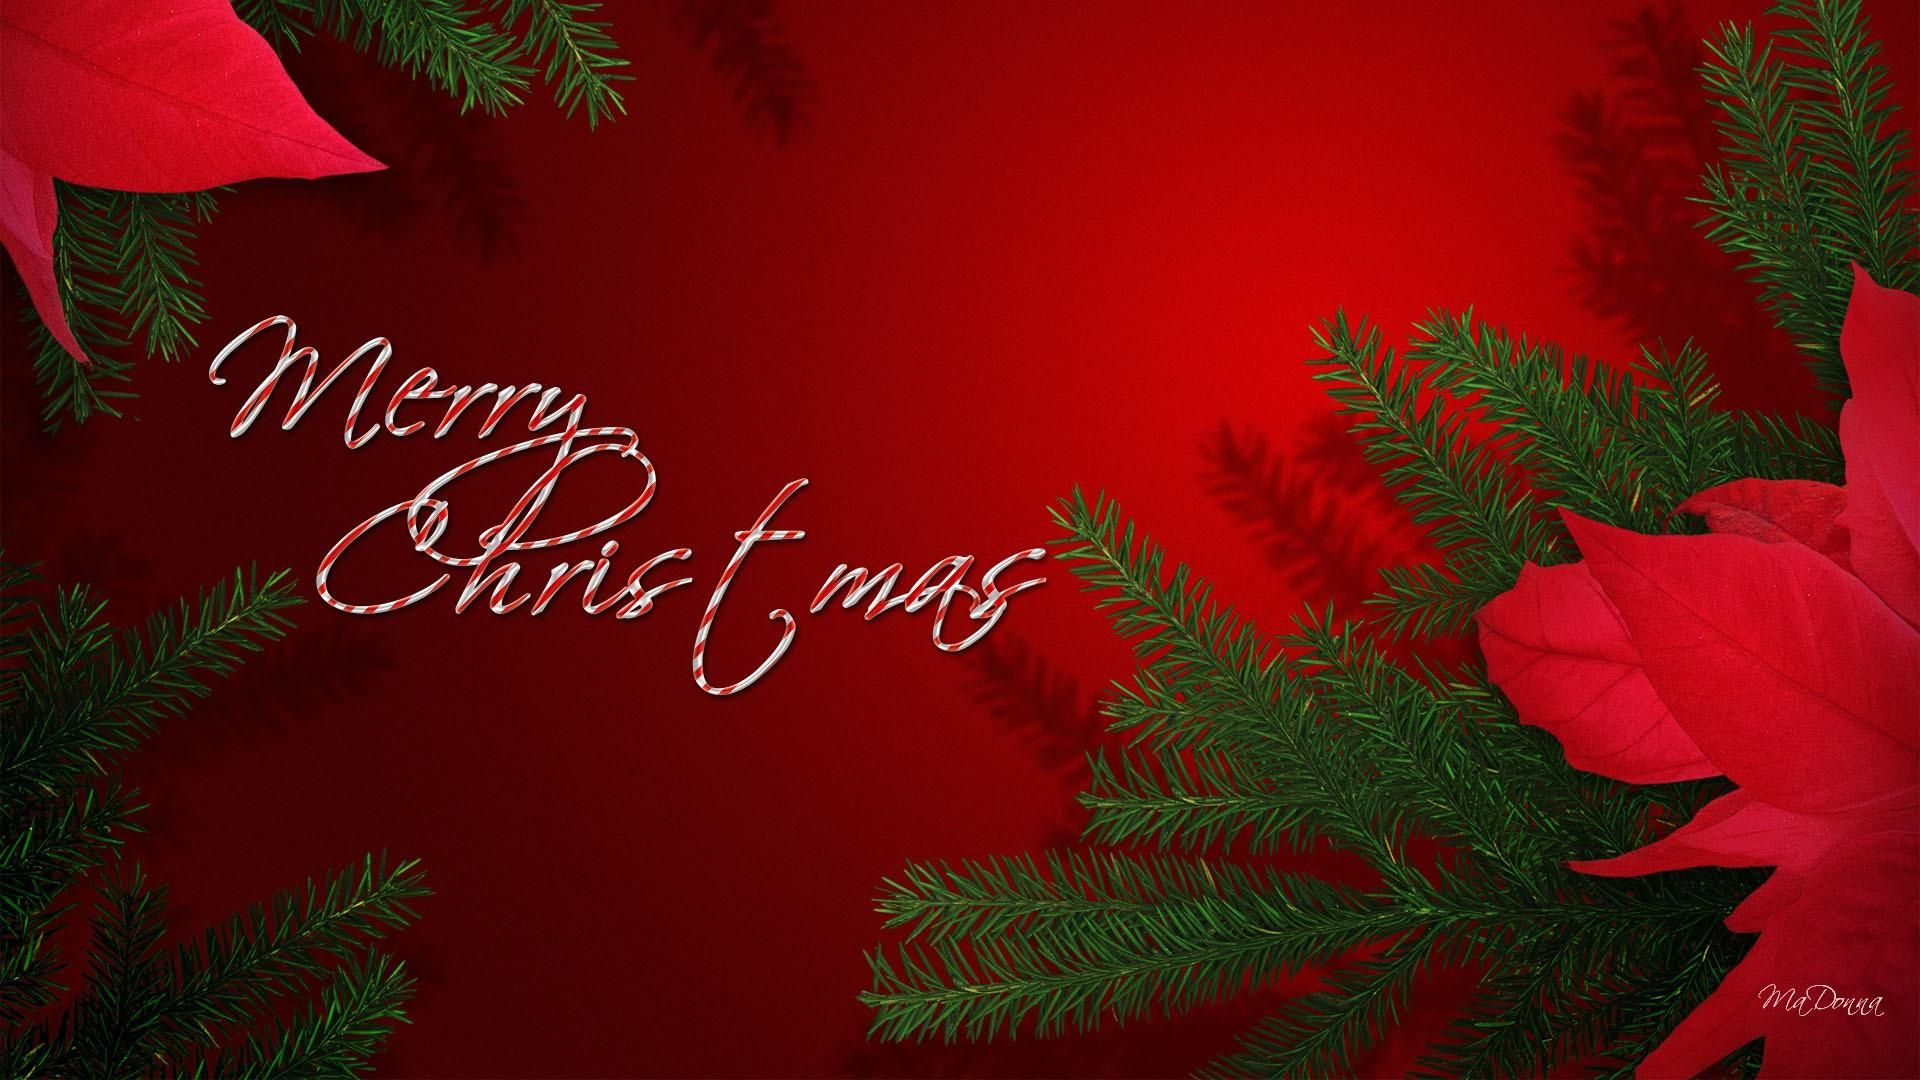 Christmas Wallpaper Hd 6999872 Merry Christmas Card Greetings Merry Christmas Greetings Christmas Wallpaper Hd